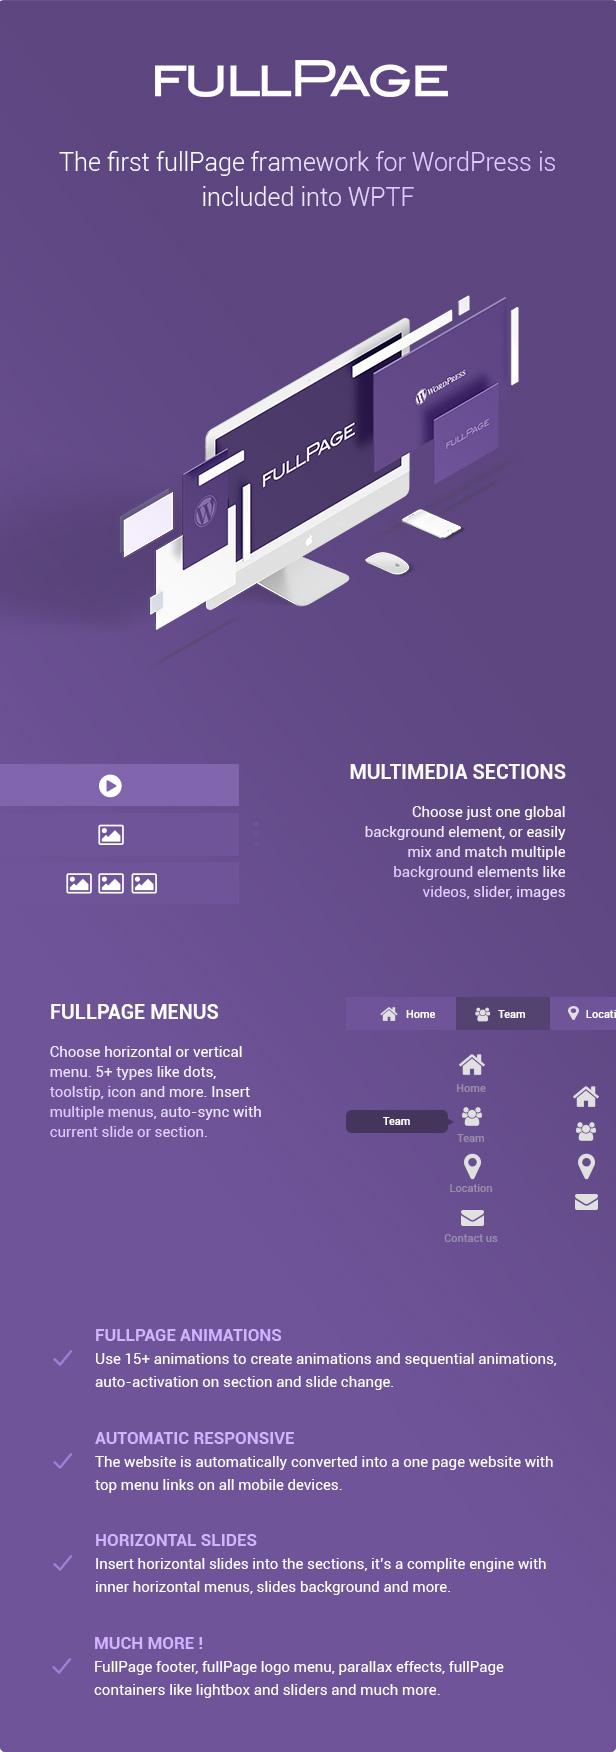 WPTF - WordPress Theme Framework - 3